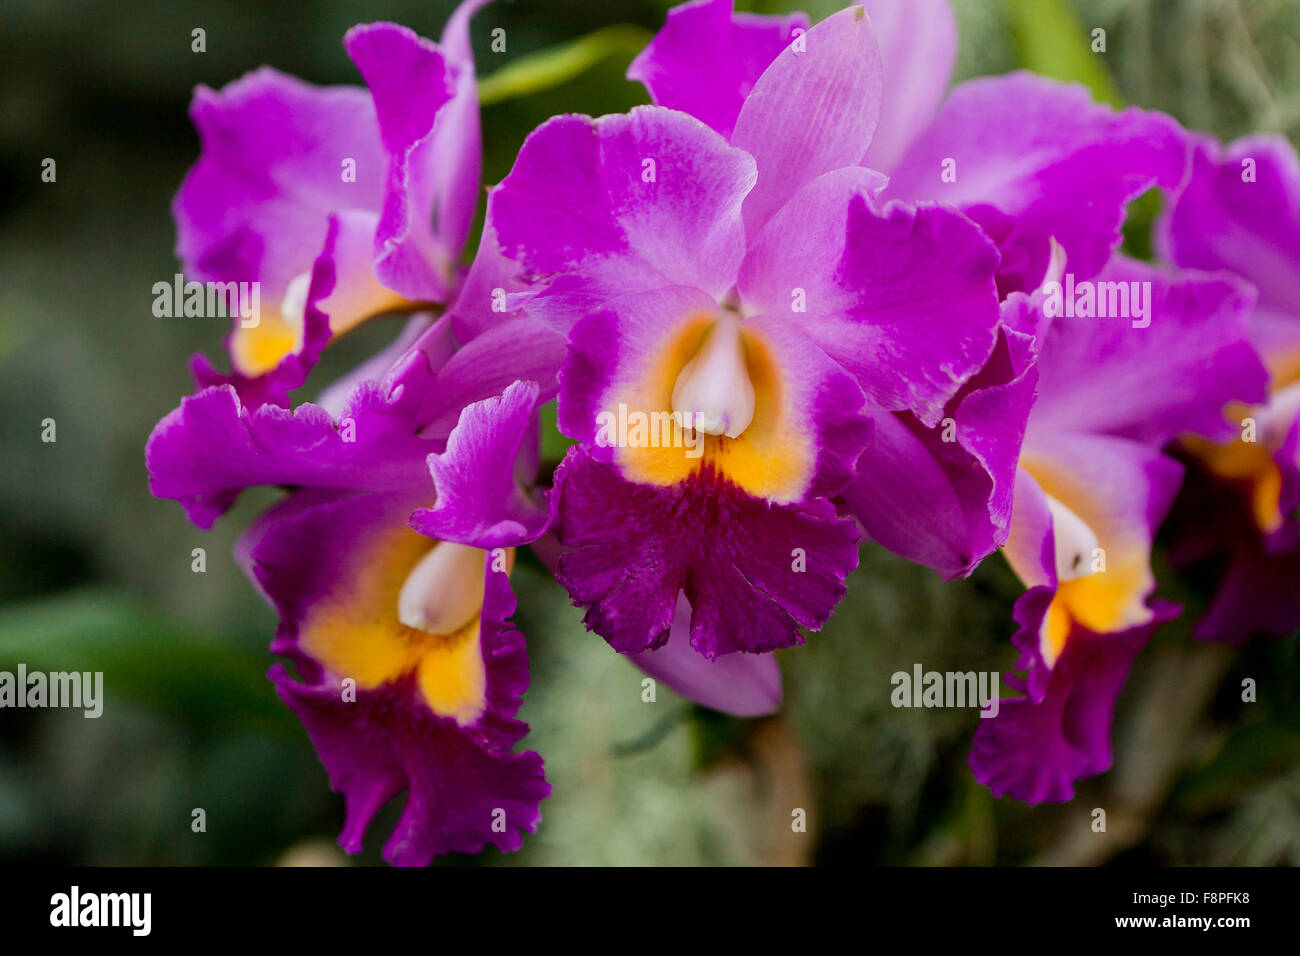 Hawaiian Charisma (Rhyncholaeliocattleya) Orchideen Blumen Stockbild